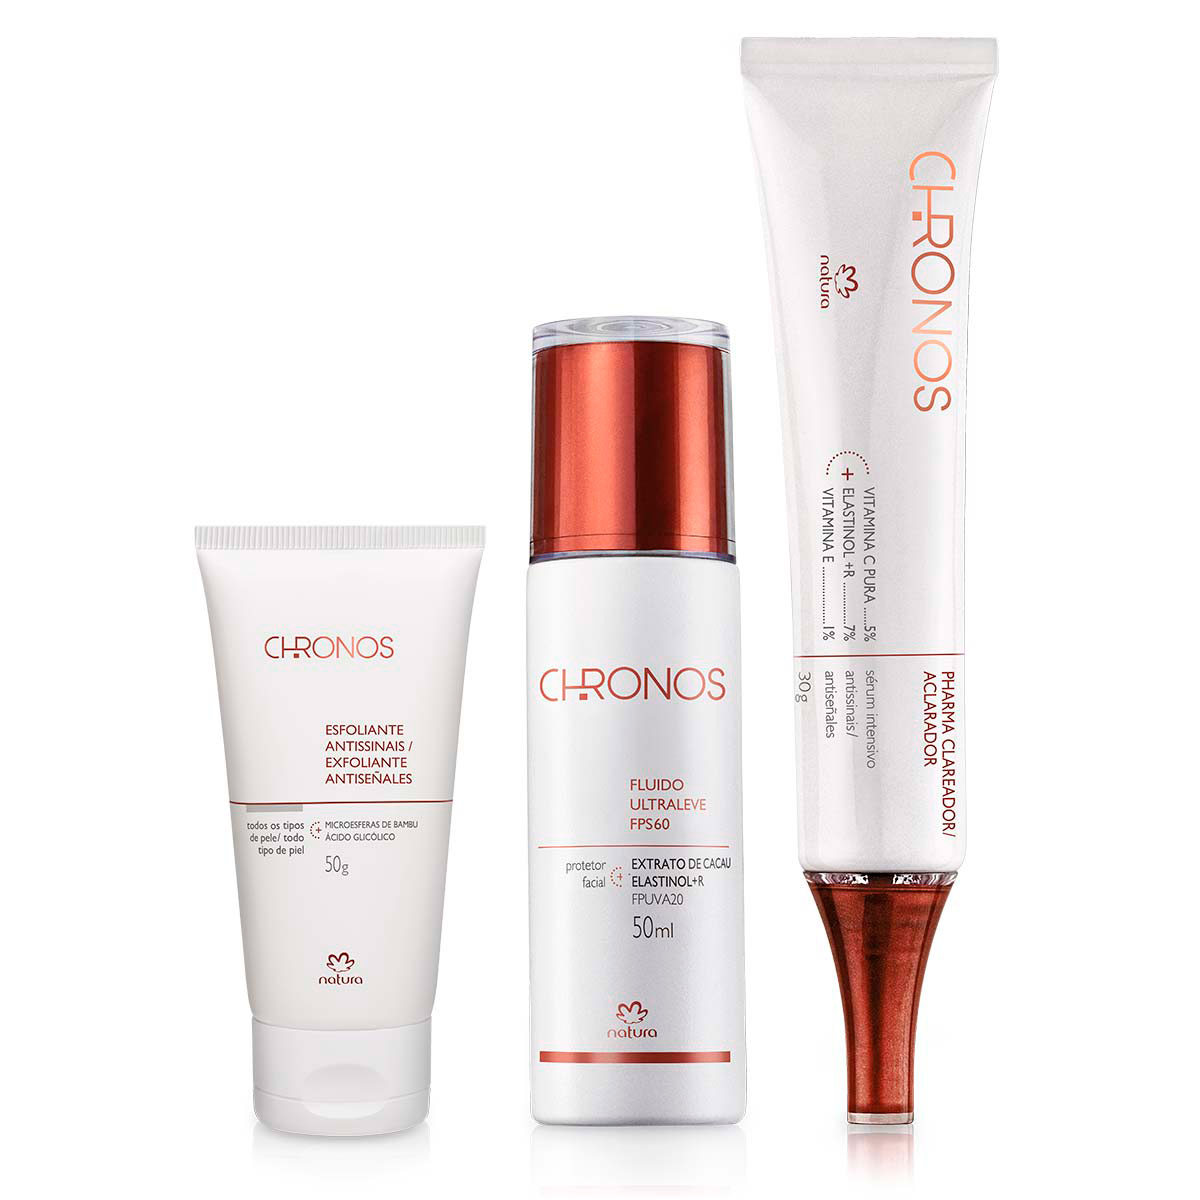 Sistema de Clareamento Chronos - Fluido Protetor Facial + Pharma Gel Clareador + Esfoliante Antissinais - 67924